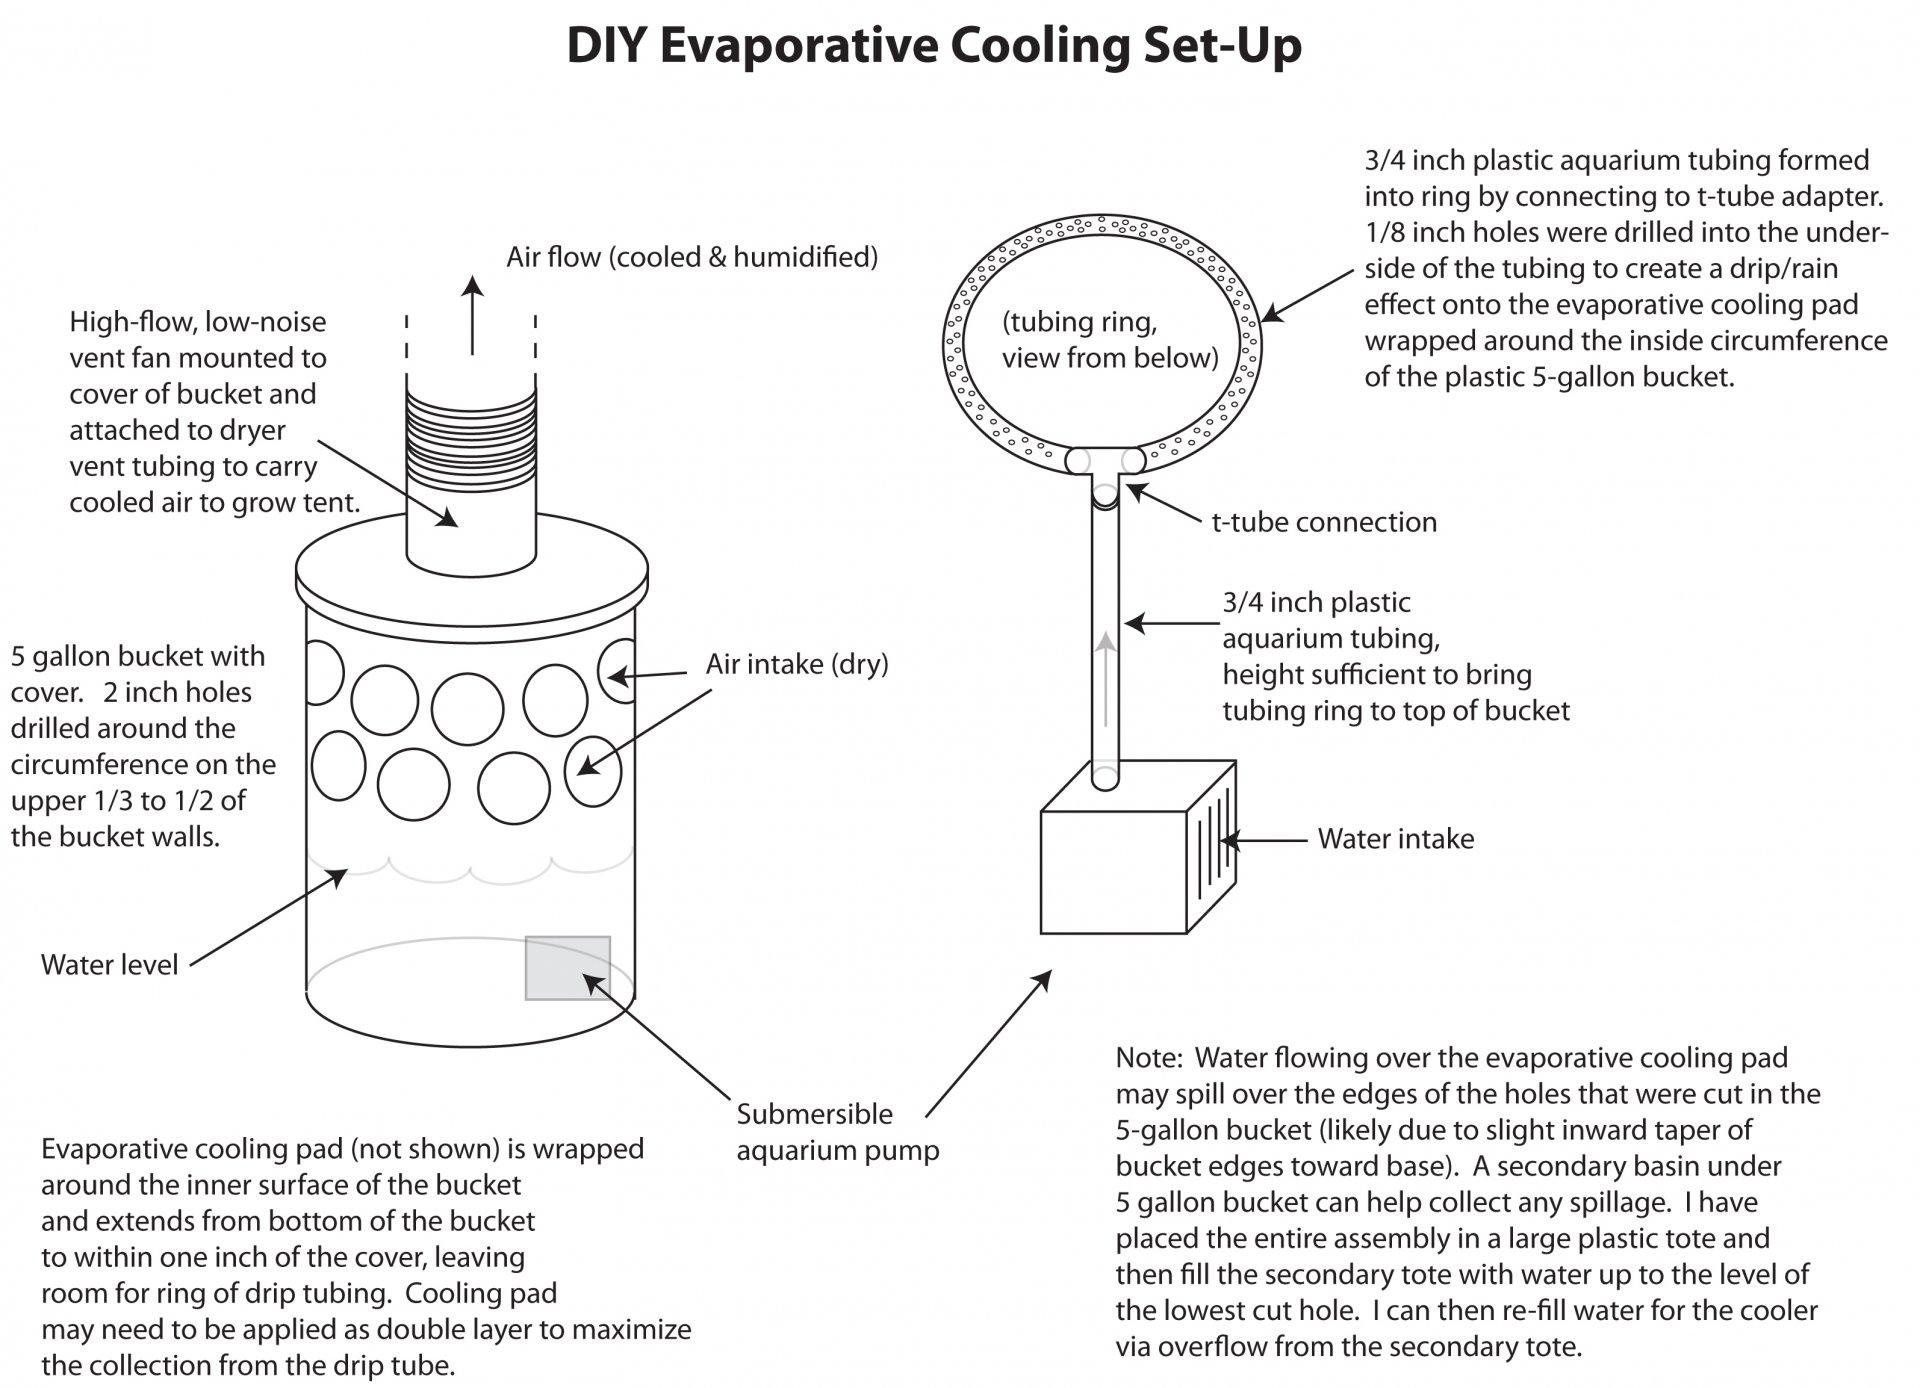 diy evaporative cooler set